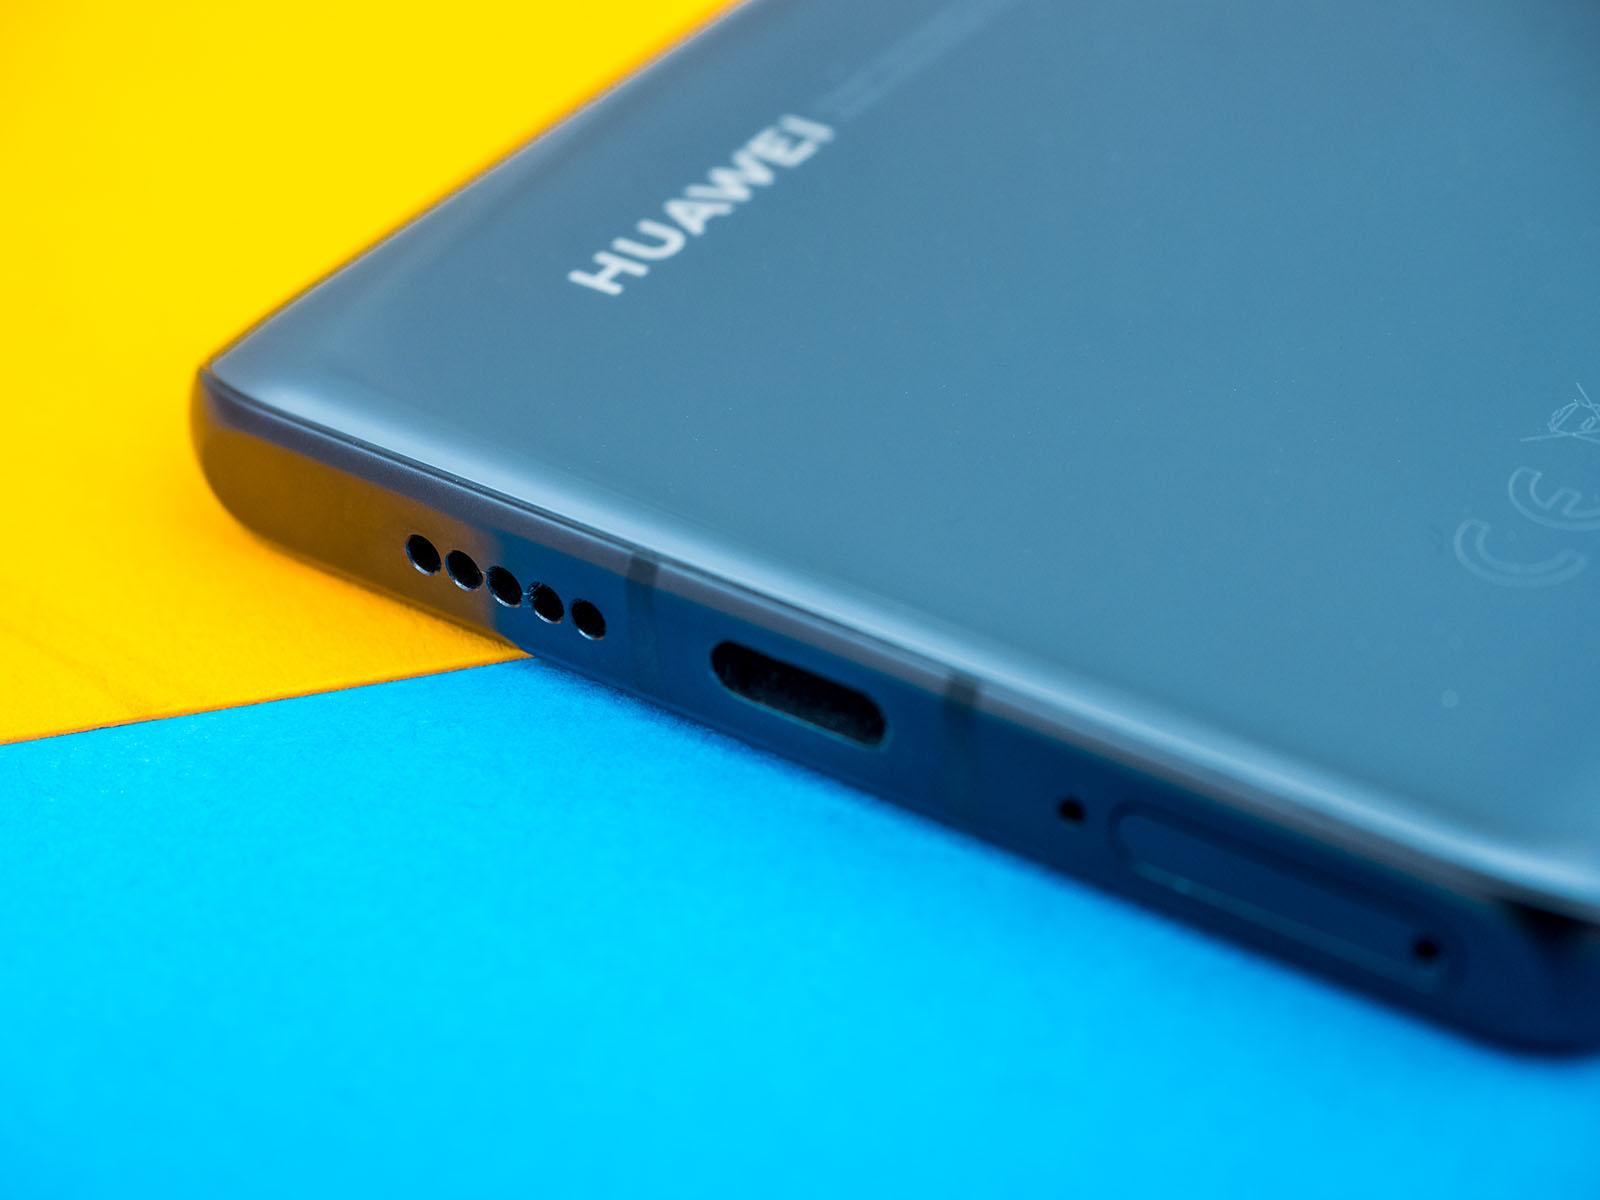 Huawei P30 Pro im Test: Lautsprecher